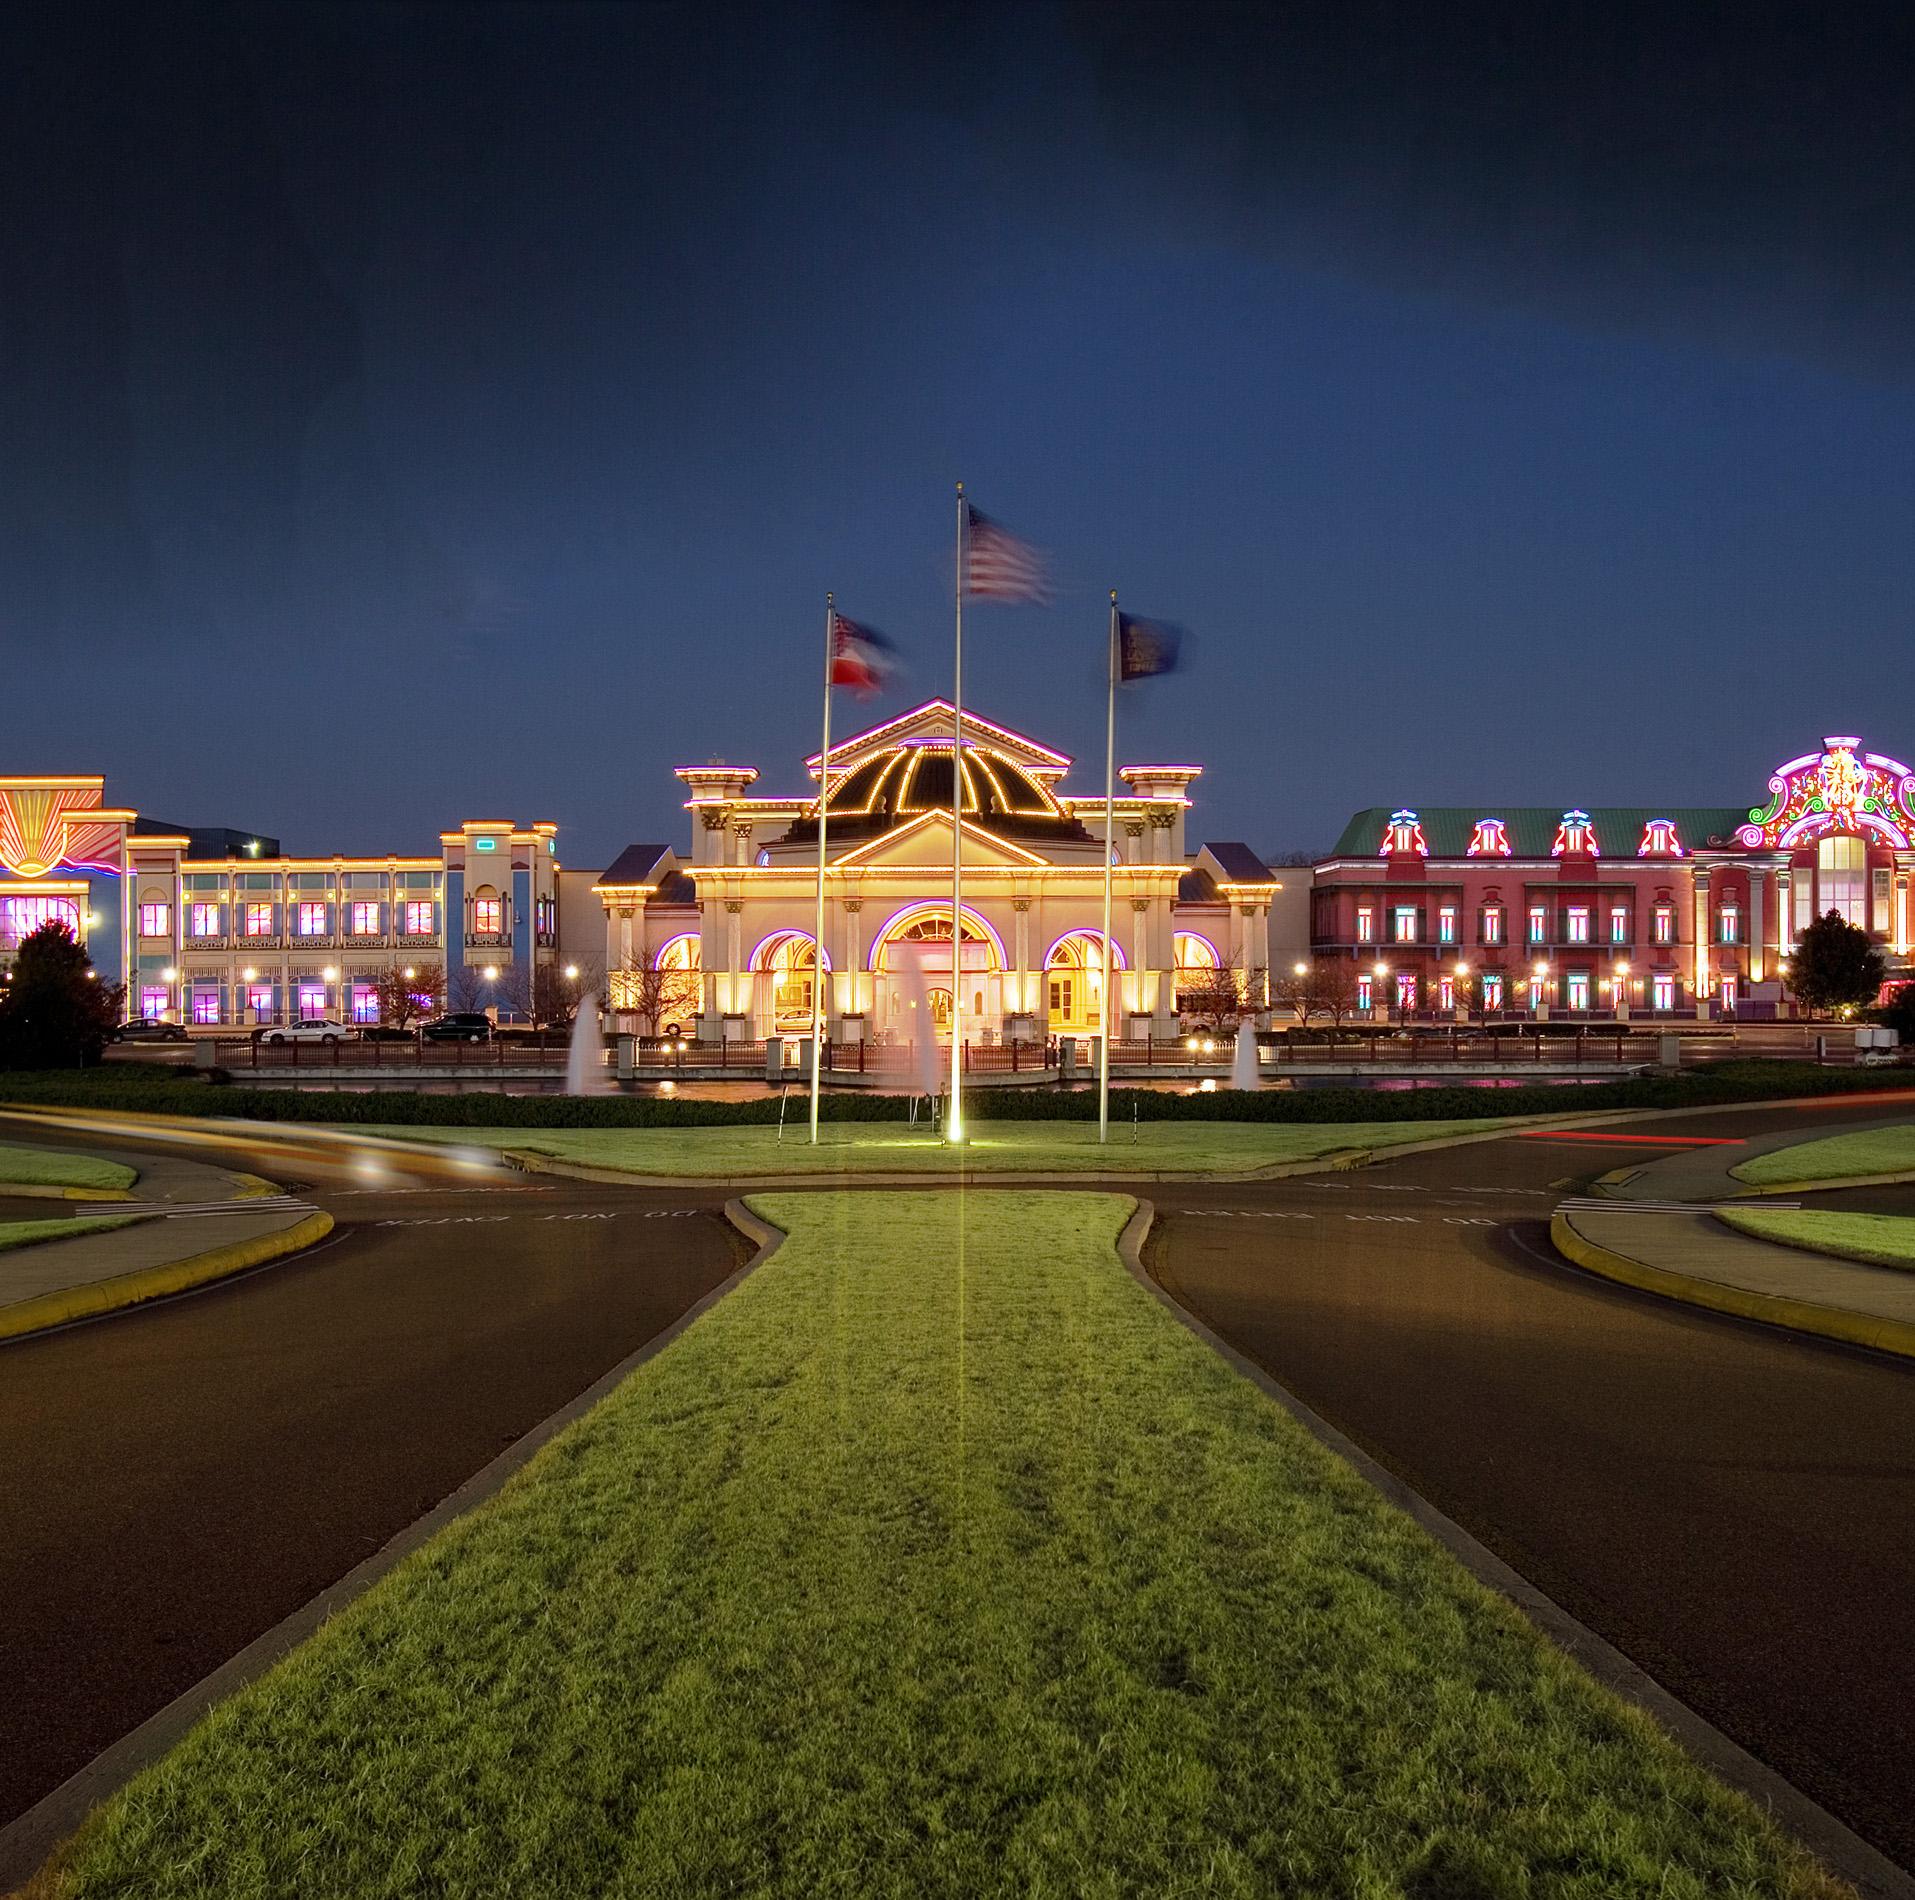 Harrahs Casino Tunica